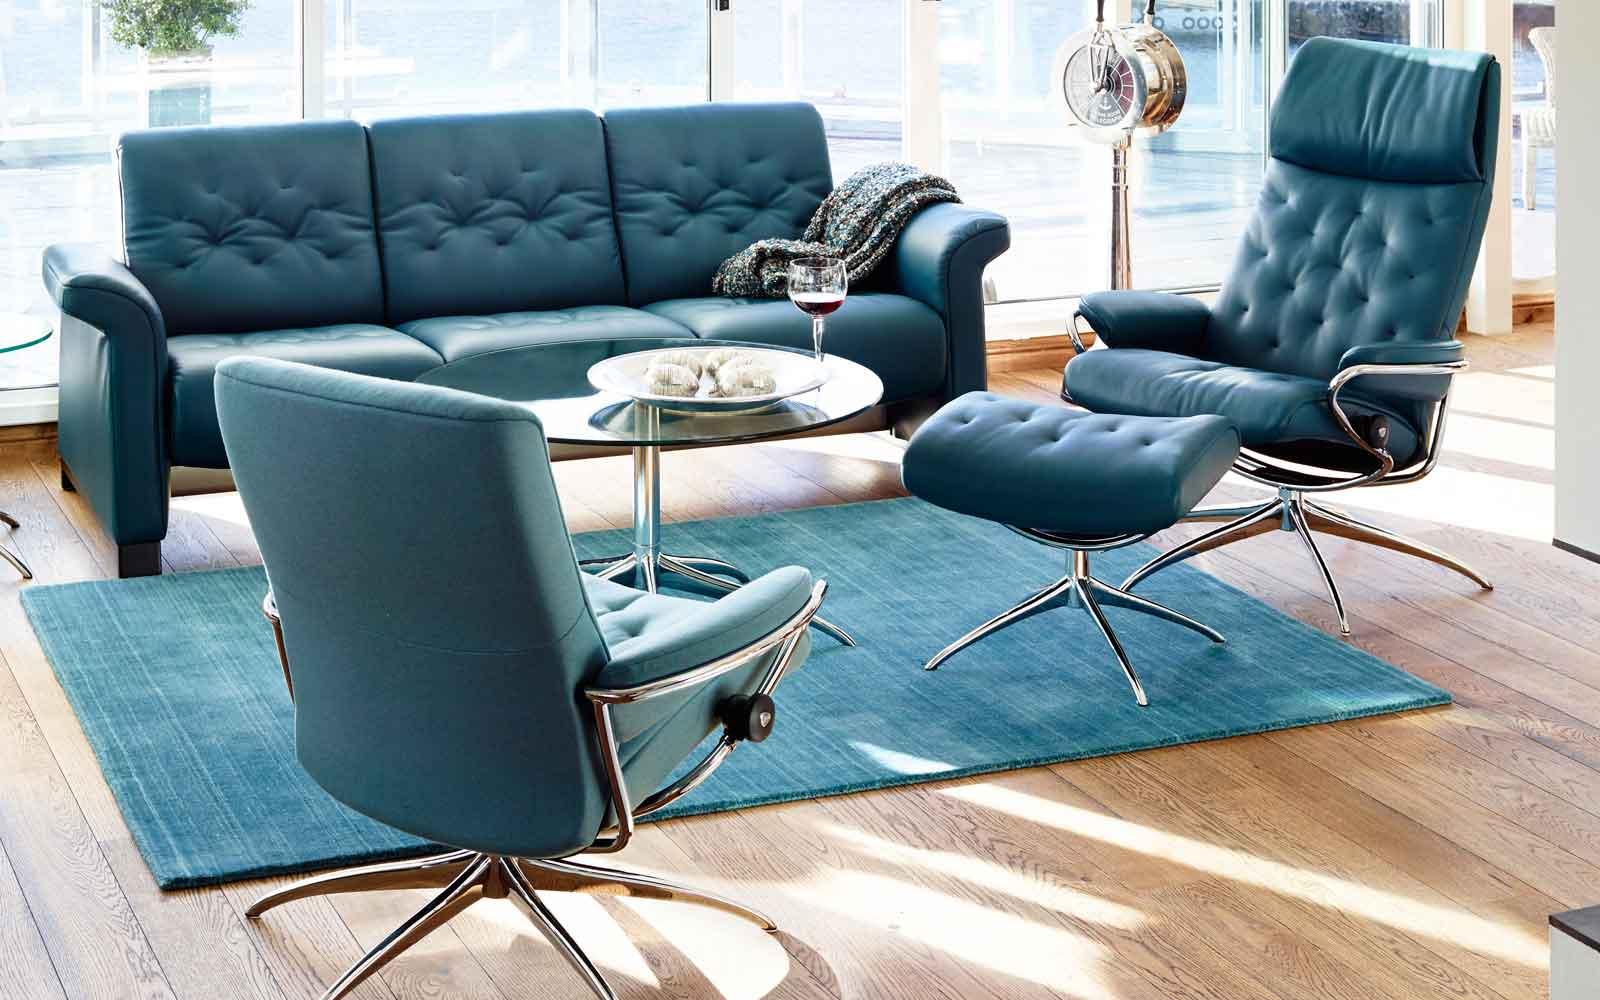 calligaris sofas uk leather sofa futon home midfurn furniture superstore